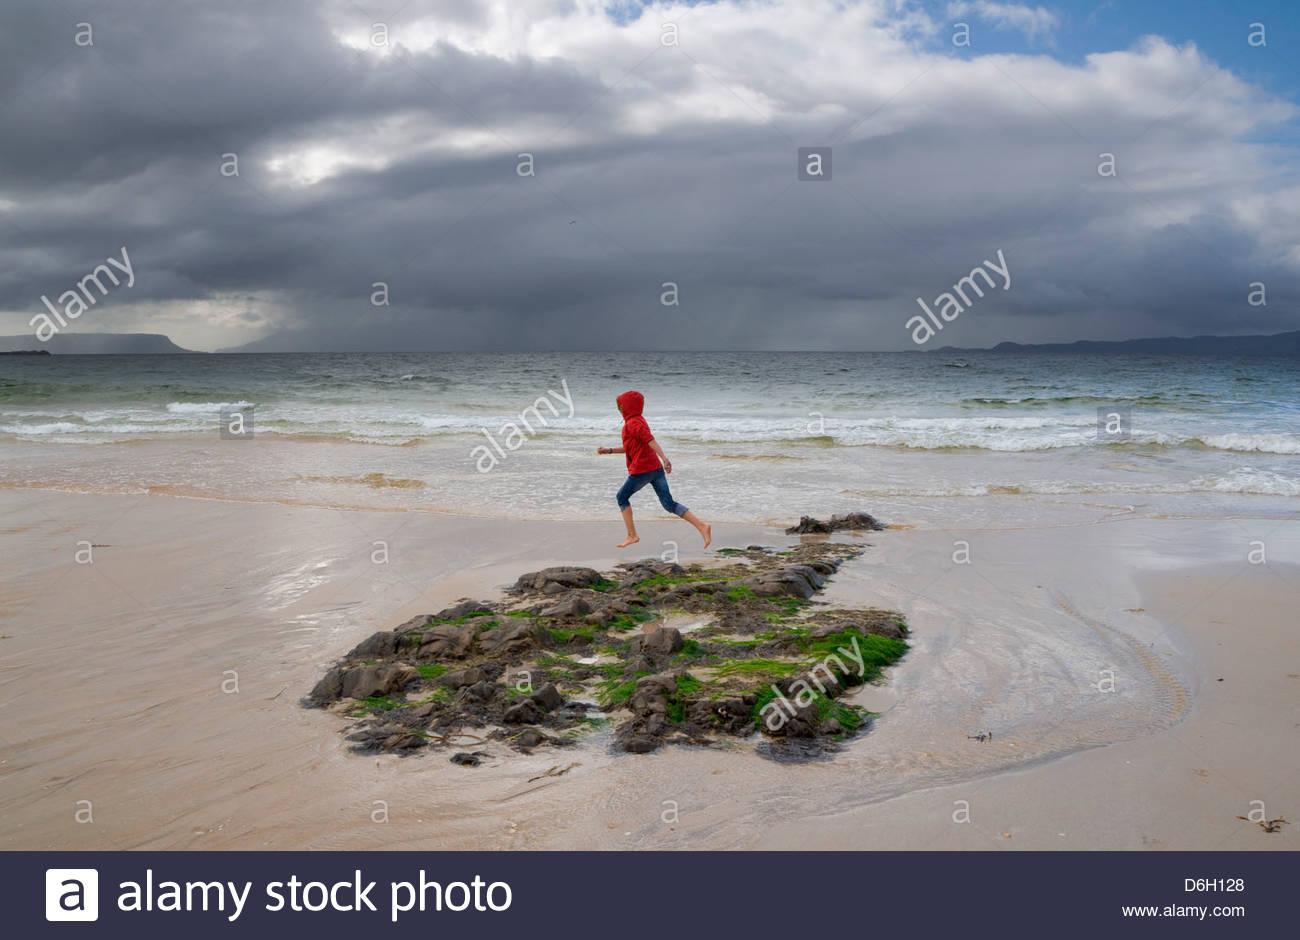 Girl running beach Morar Inverness-shire Scotland UK - Stock Image